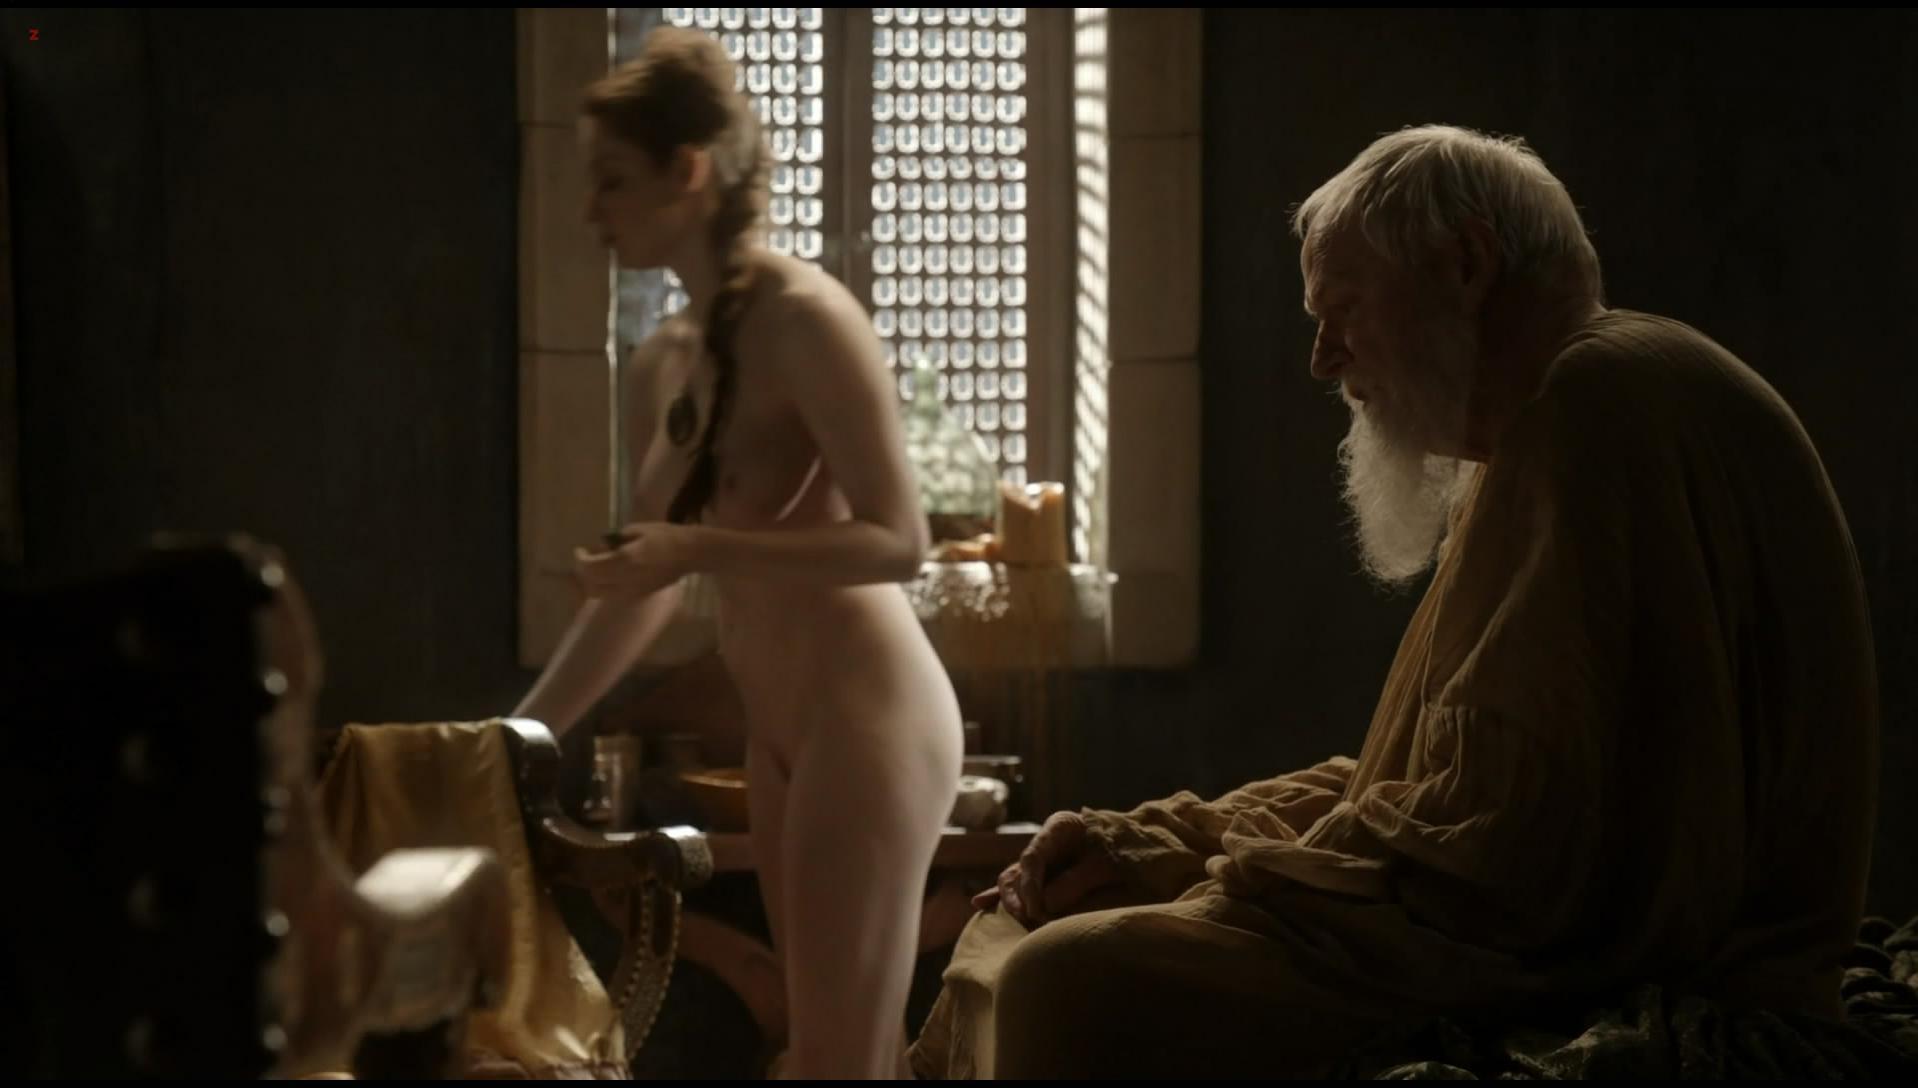 Esme Bianco nude - Game of Thrones s01e10 (2011)